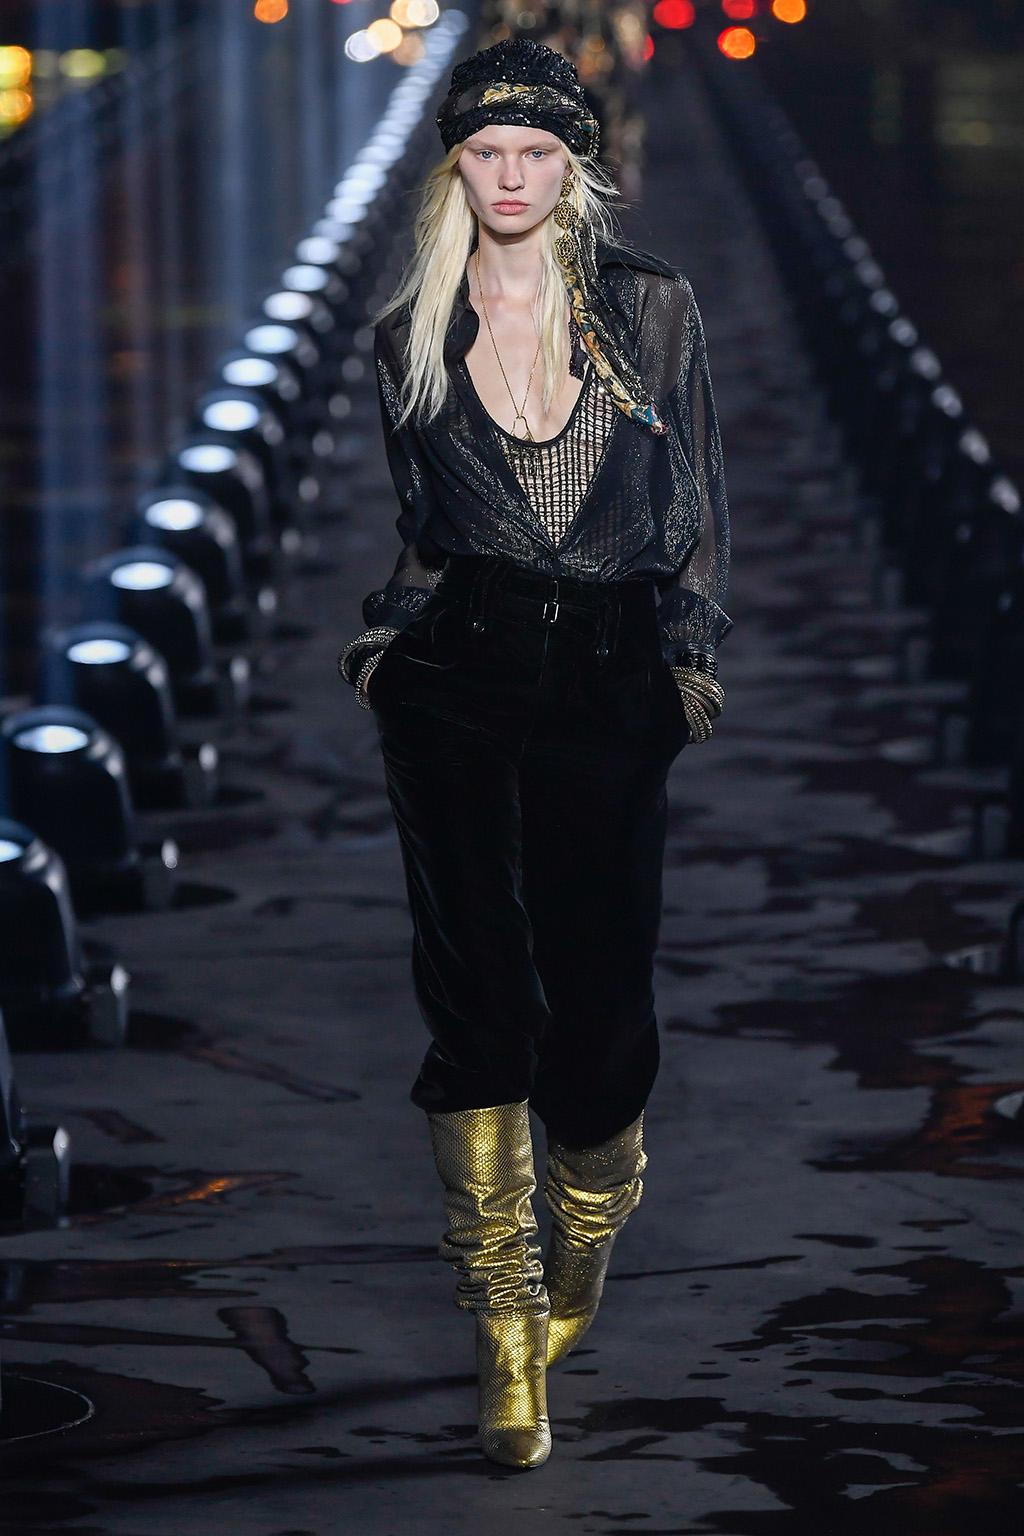 Model on the catwalkSaint Laurent show, Runway, Spring Summer 2020, Paris Fashion Week, France - 24 Sep 2019